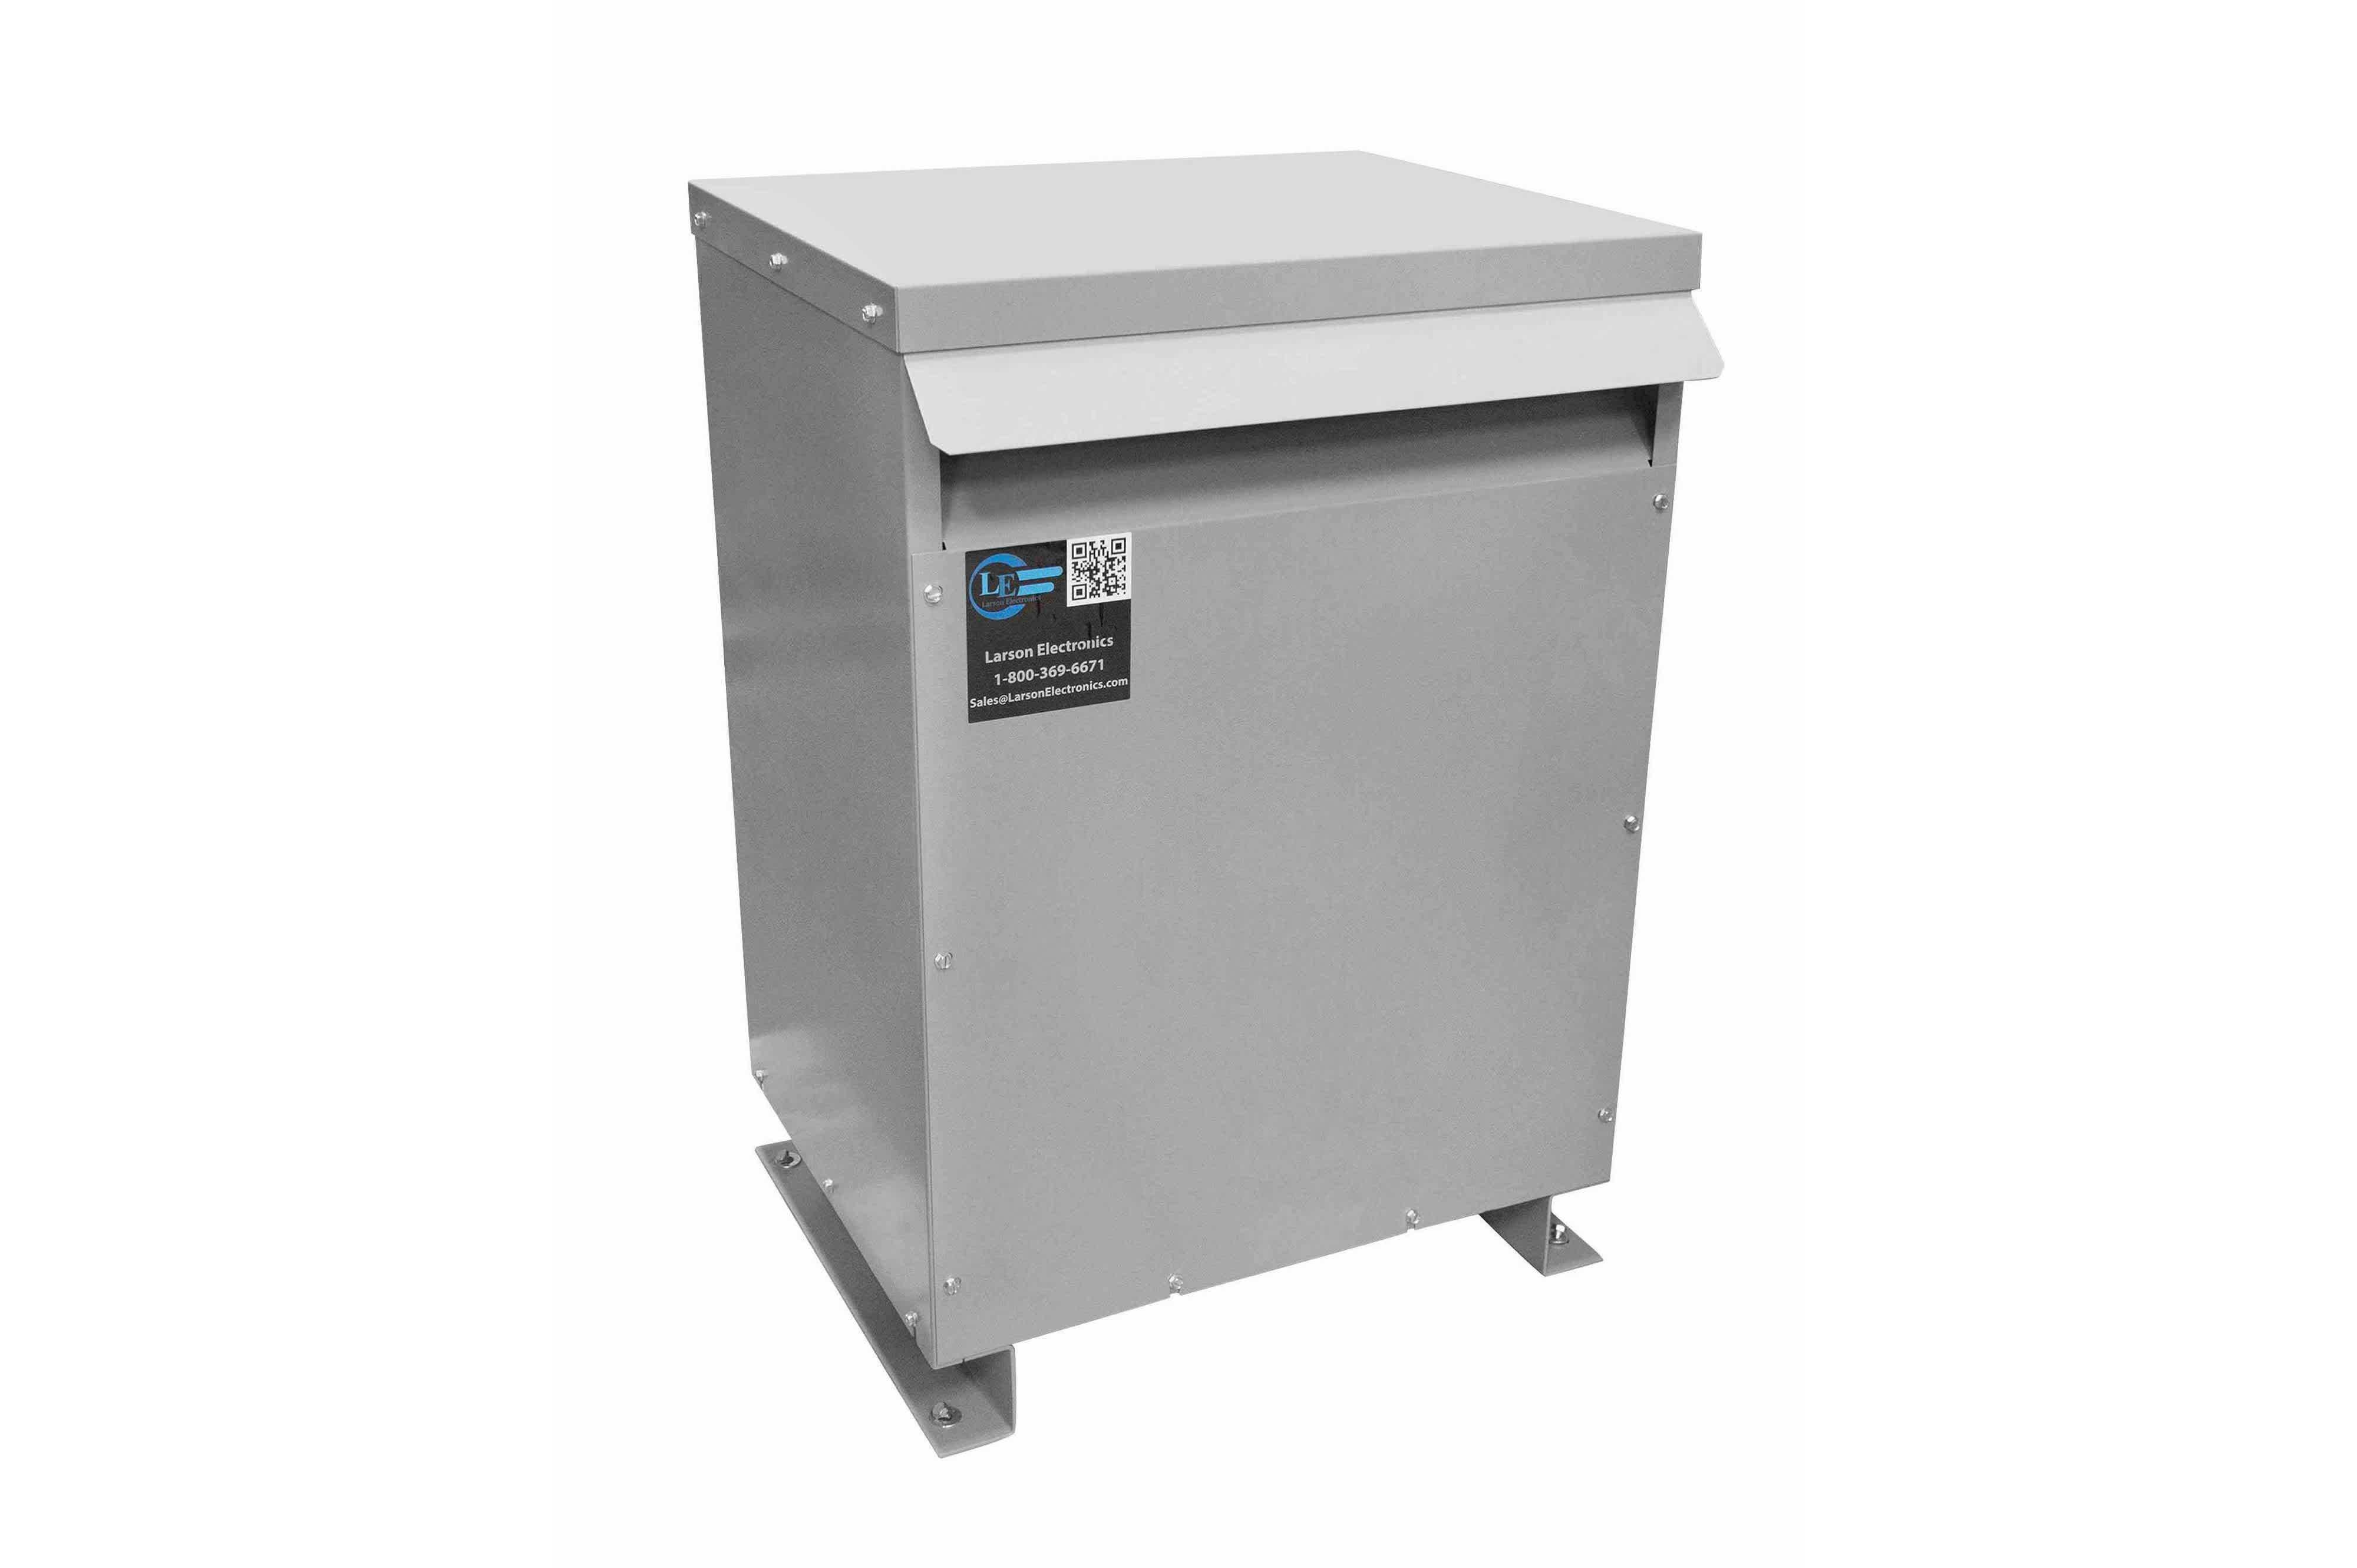 45 kVA 3PH Isolation Transformer, 415V Wye Primary, 240V Delta Secondary, N3R, Ventilated, 60 Hz